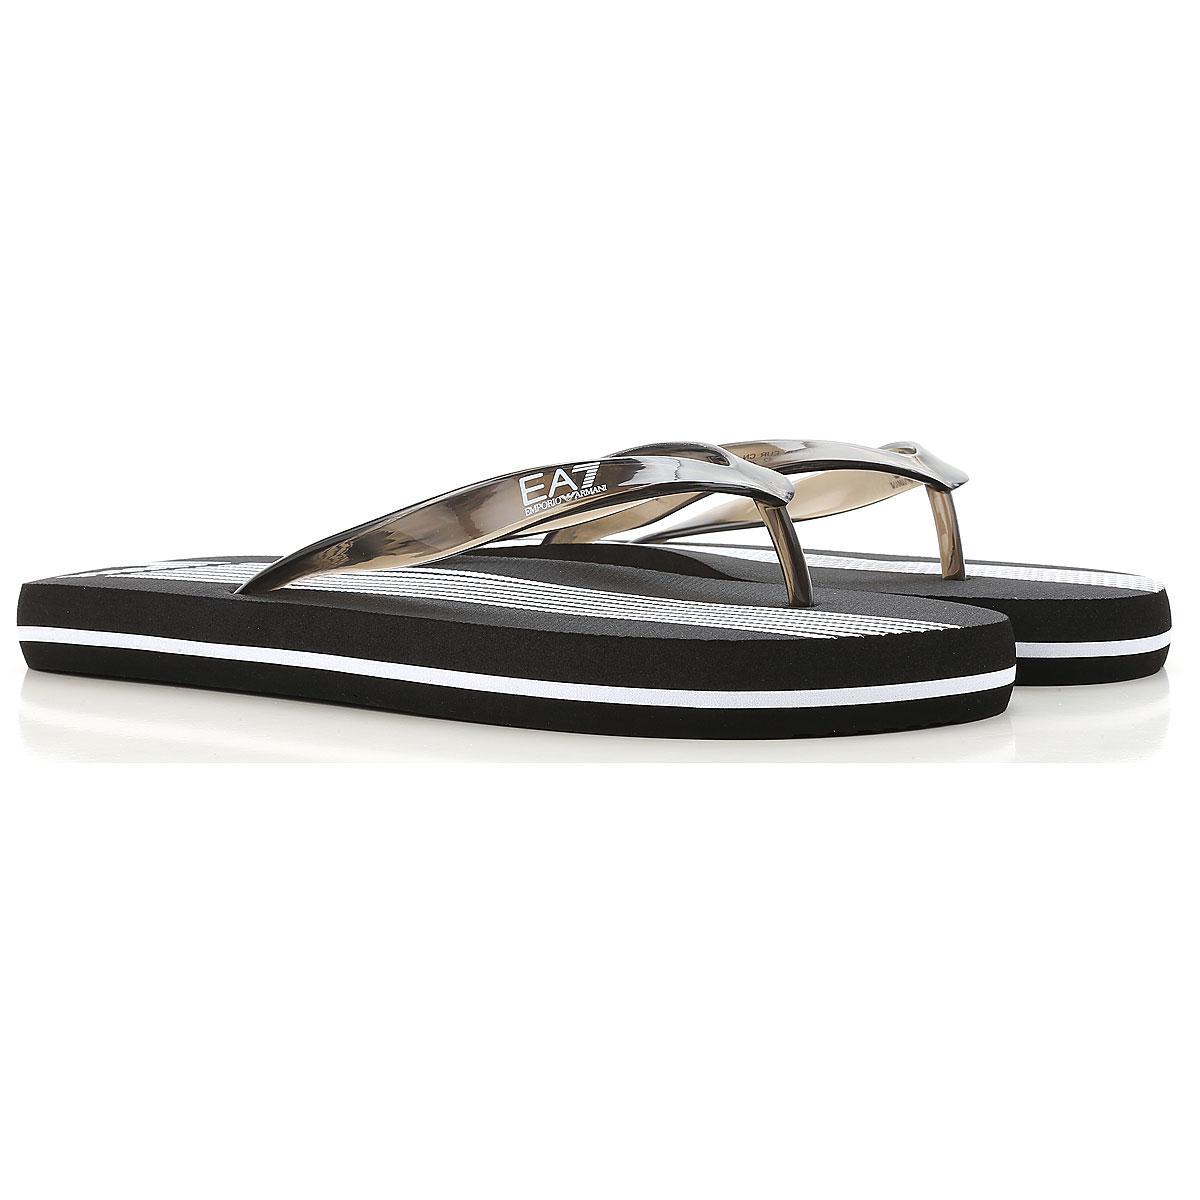 Image of Emporio Armani Flip Flops for Men On Sale, Ea7, Black, Rubber, 2017, 10.5 11.5